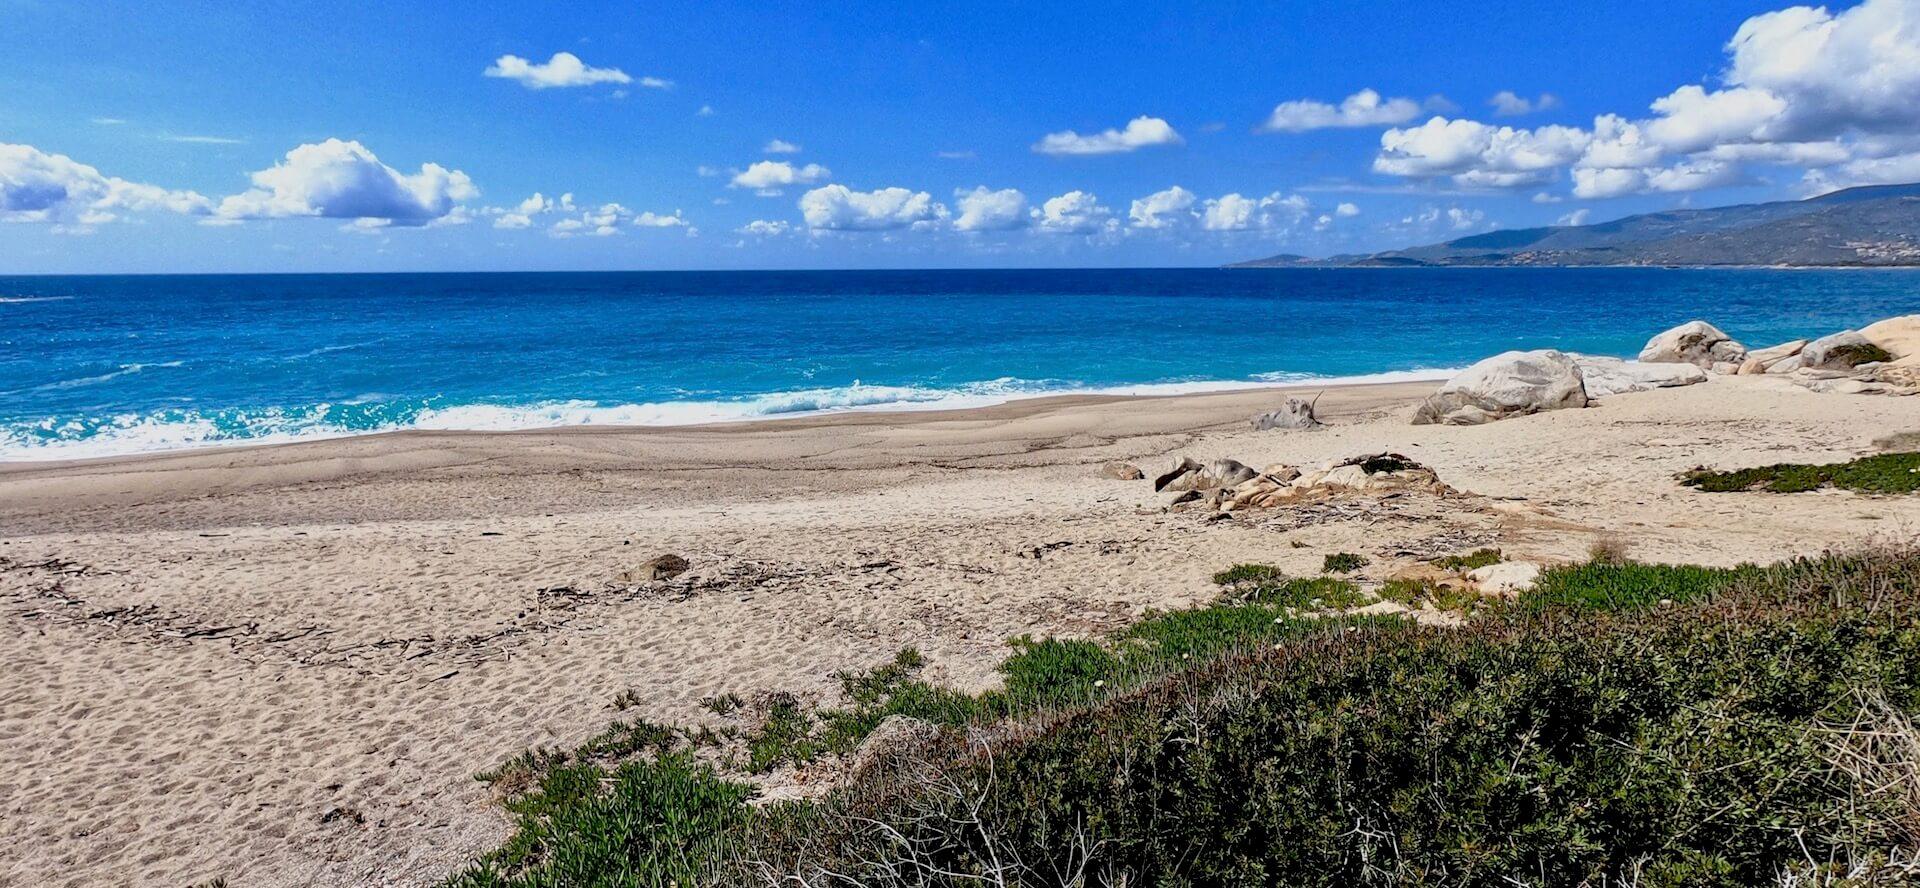 La plage du Liamone en Corse